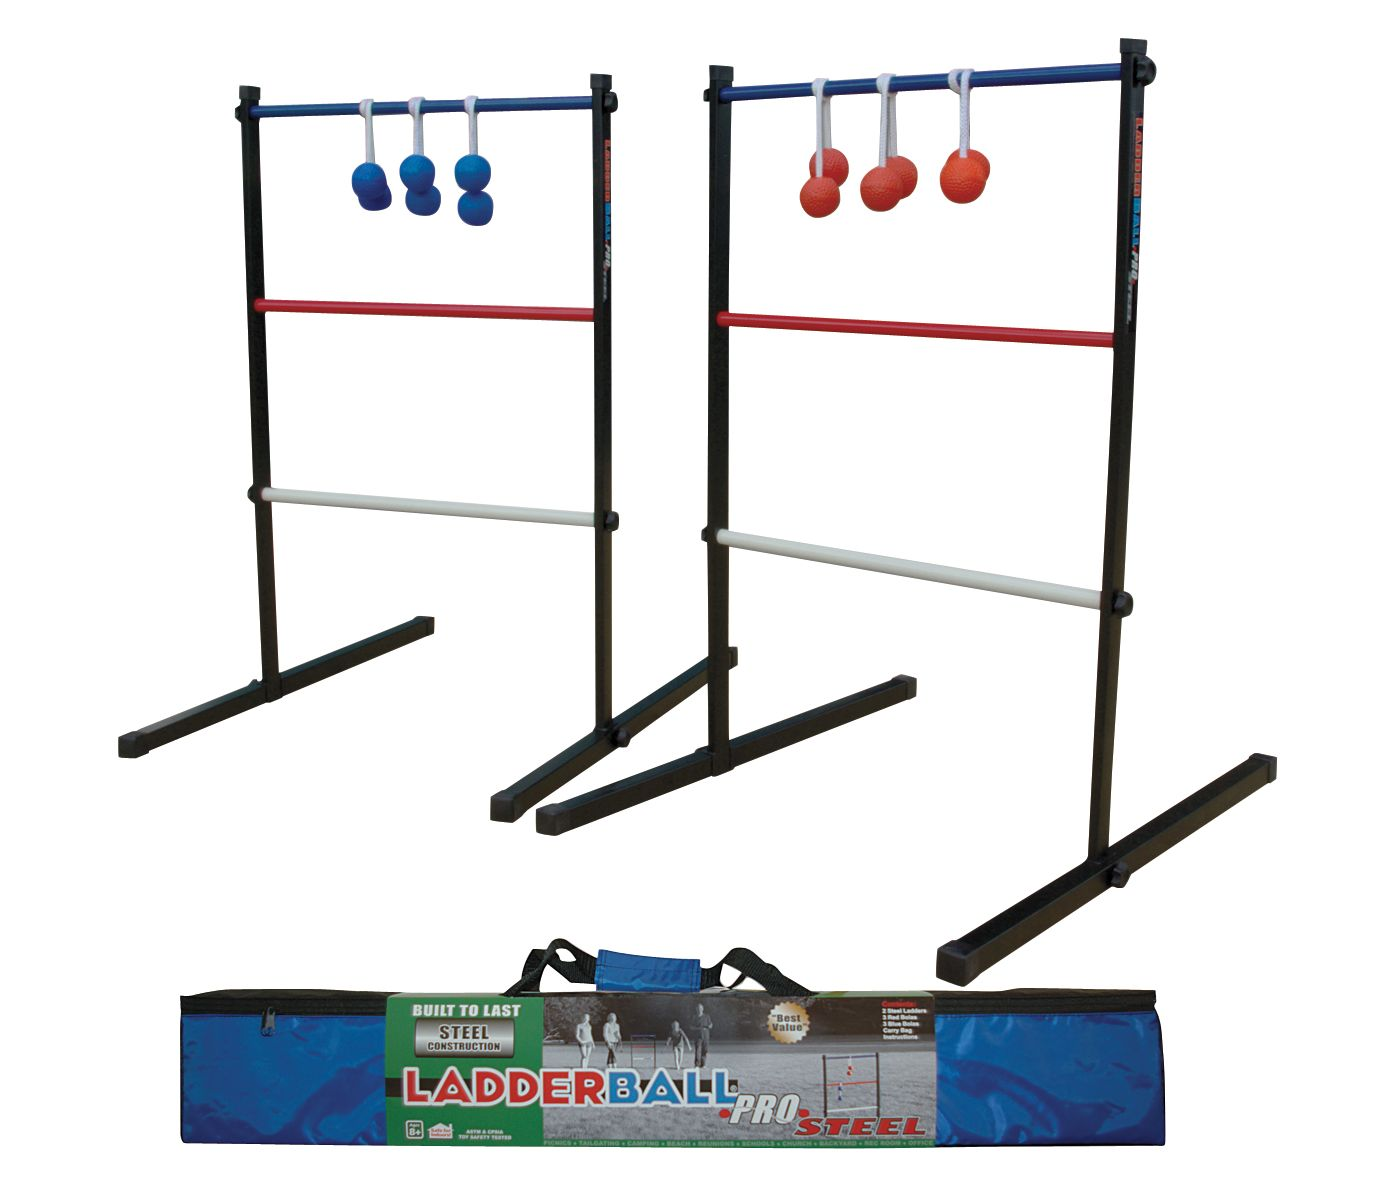 Maranda Ladderball Pro Steel Game